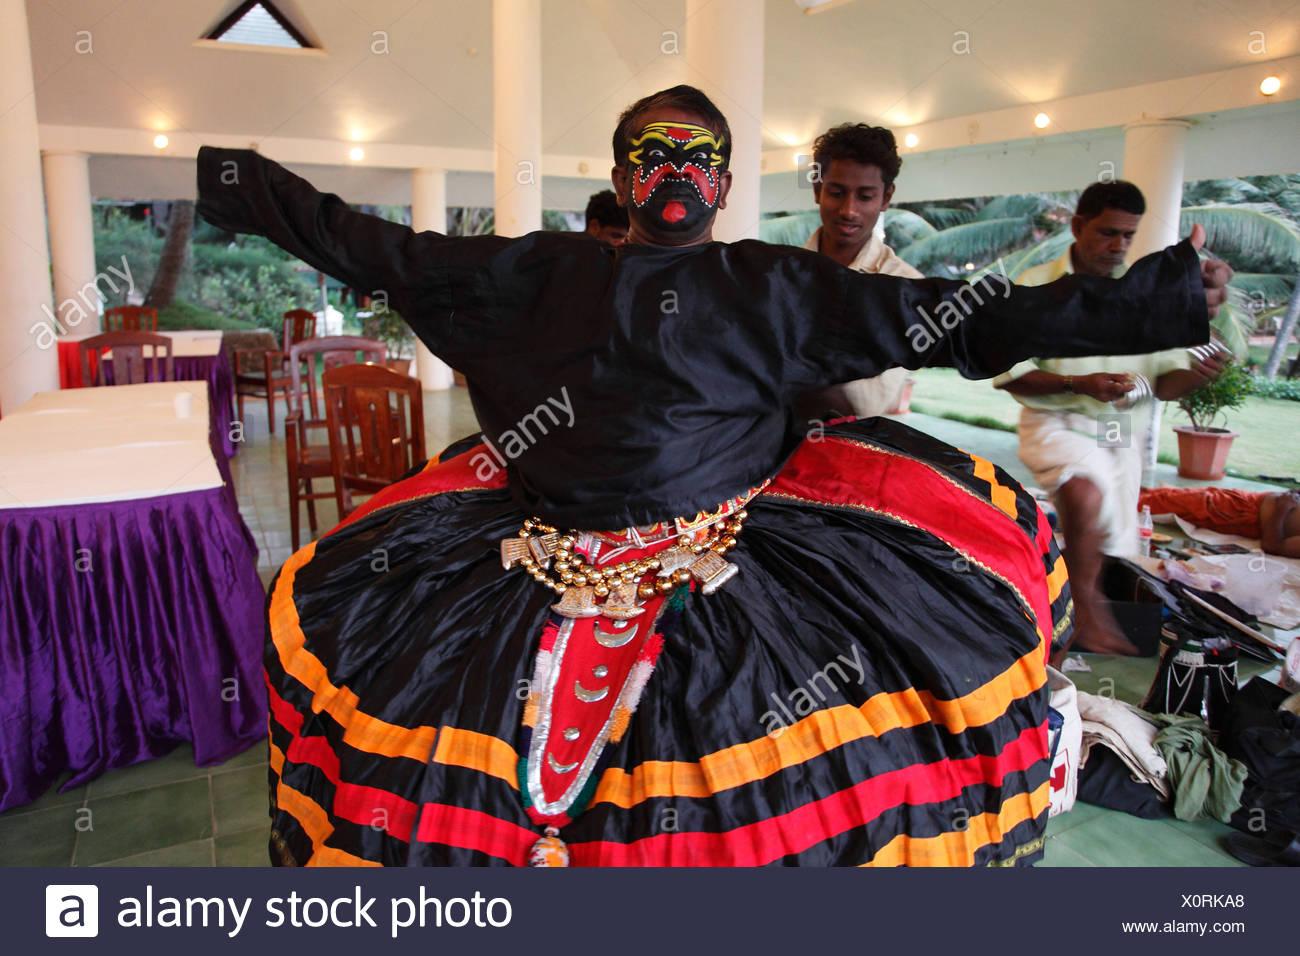 Kathakali dancer dressing, Chuvanna Thaadi character, Kerala, southern India, Asia - Stock Image